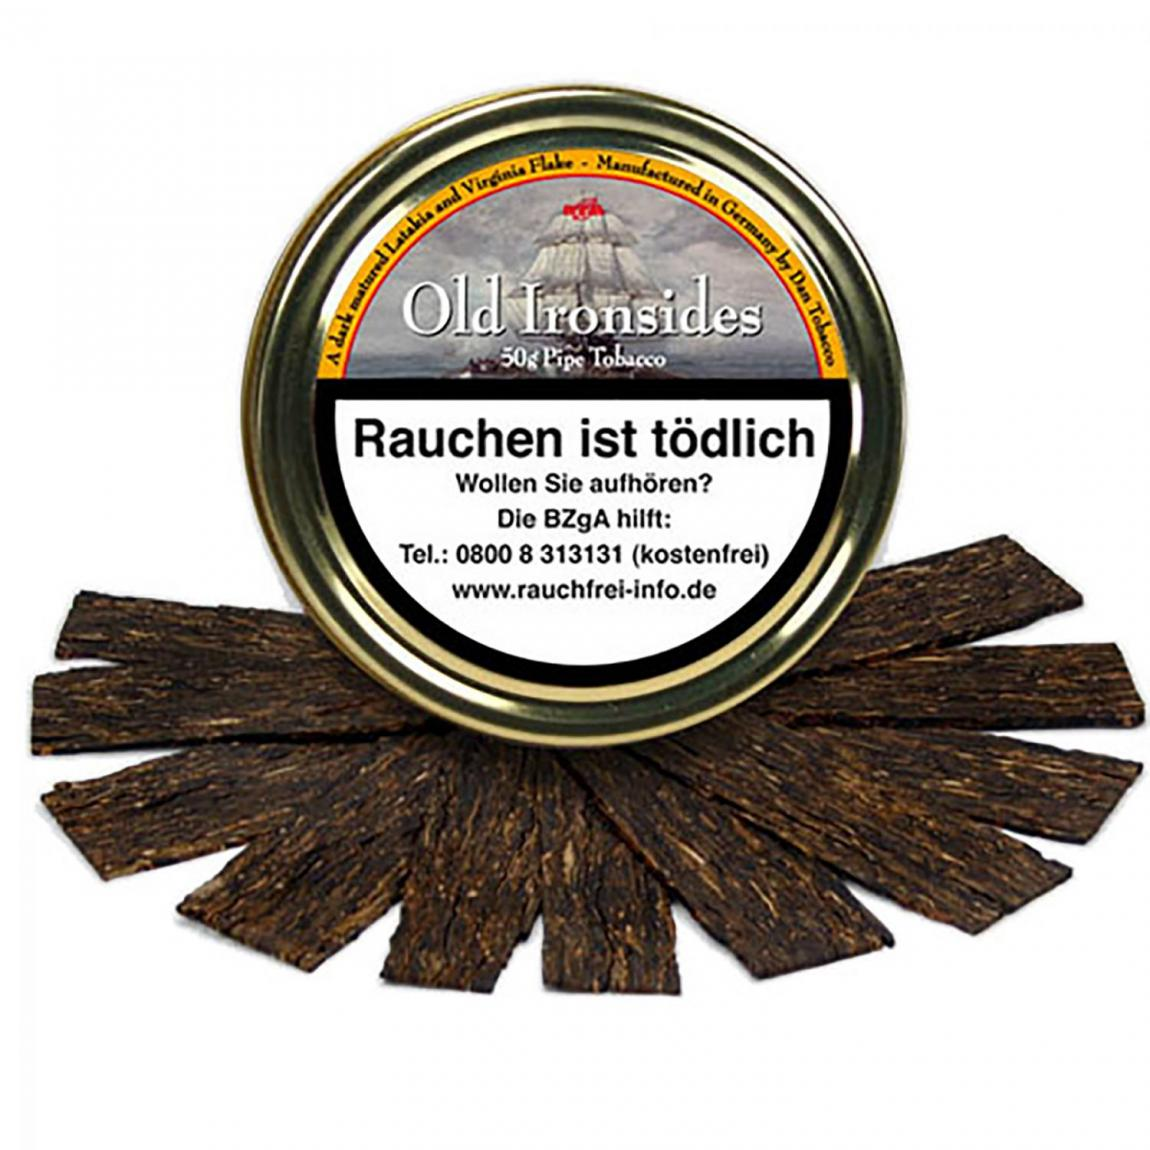 Old Ironsides Flake - kräftige Würze & süß getöntes Aroma